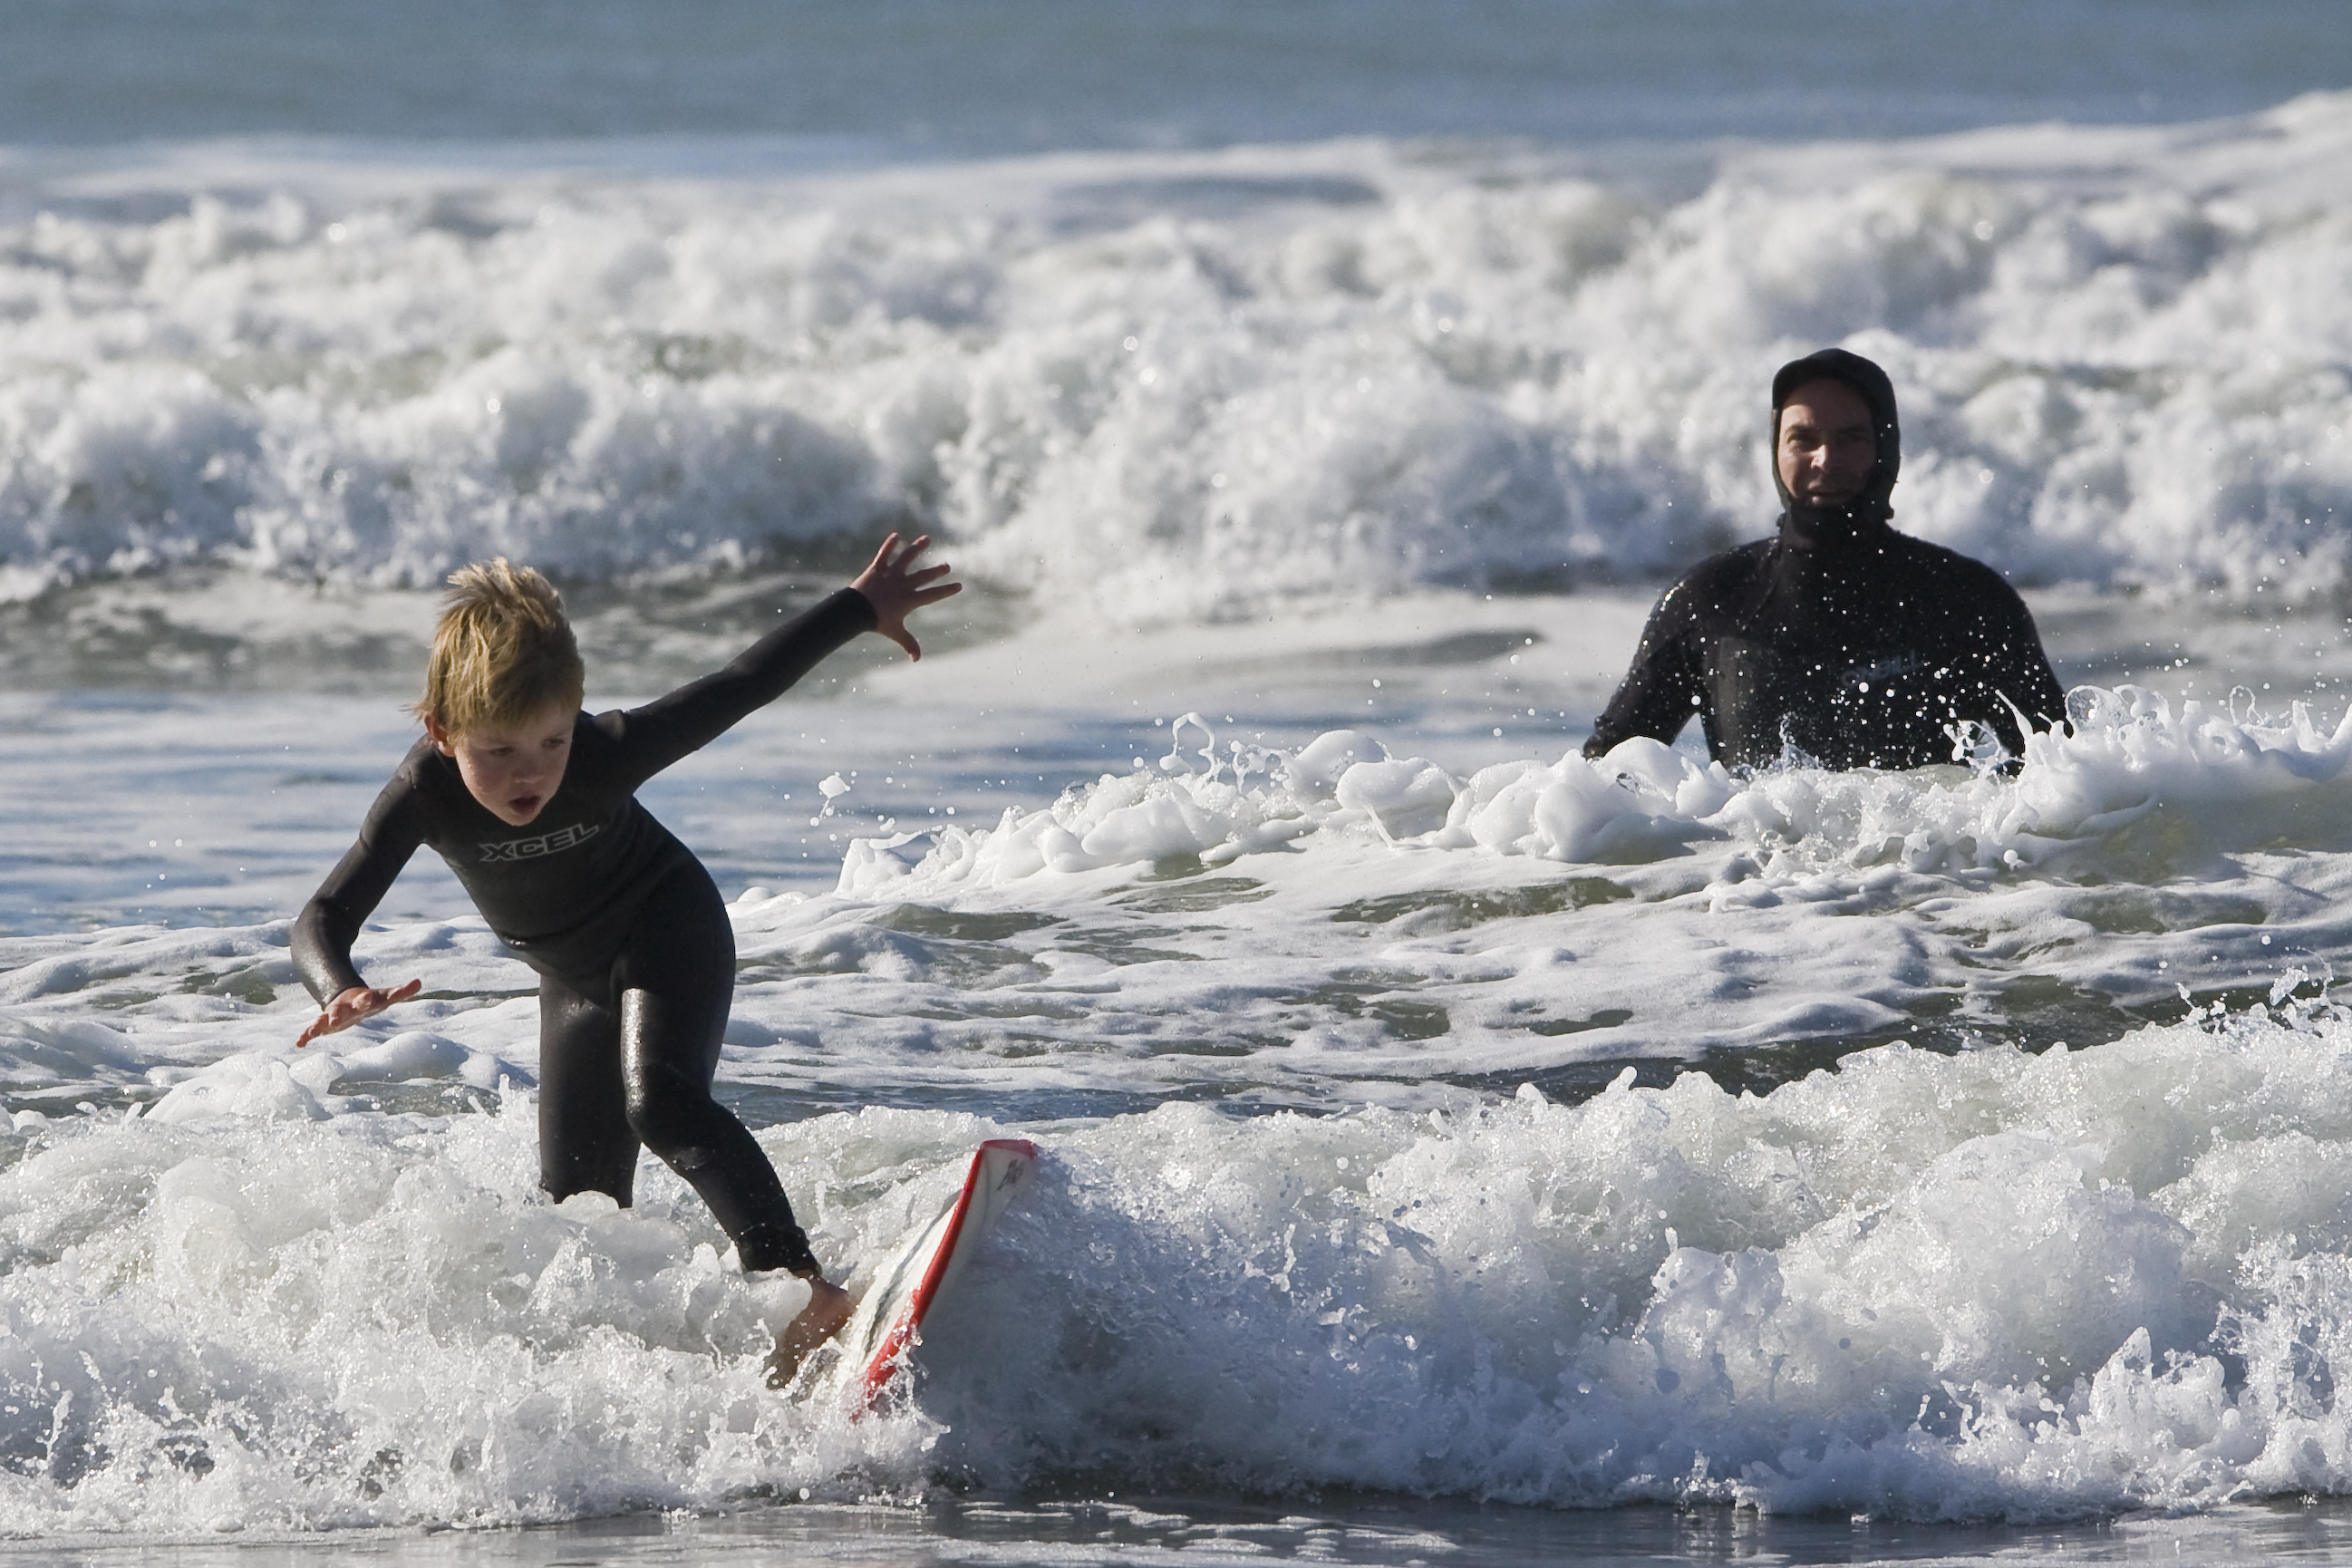 Surfing El Morro Laguna Beach